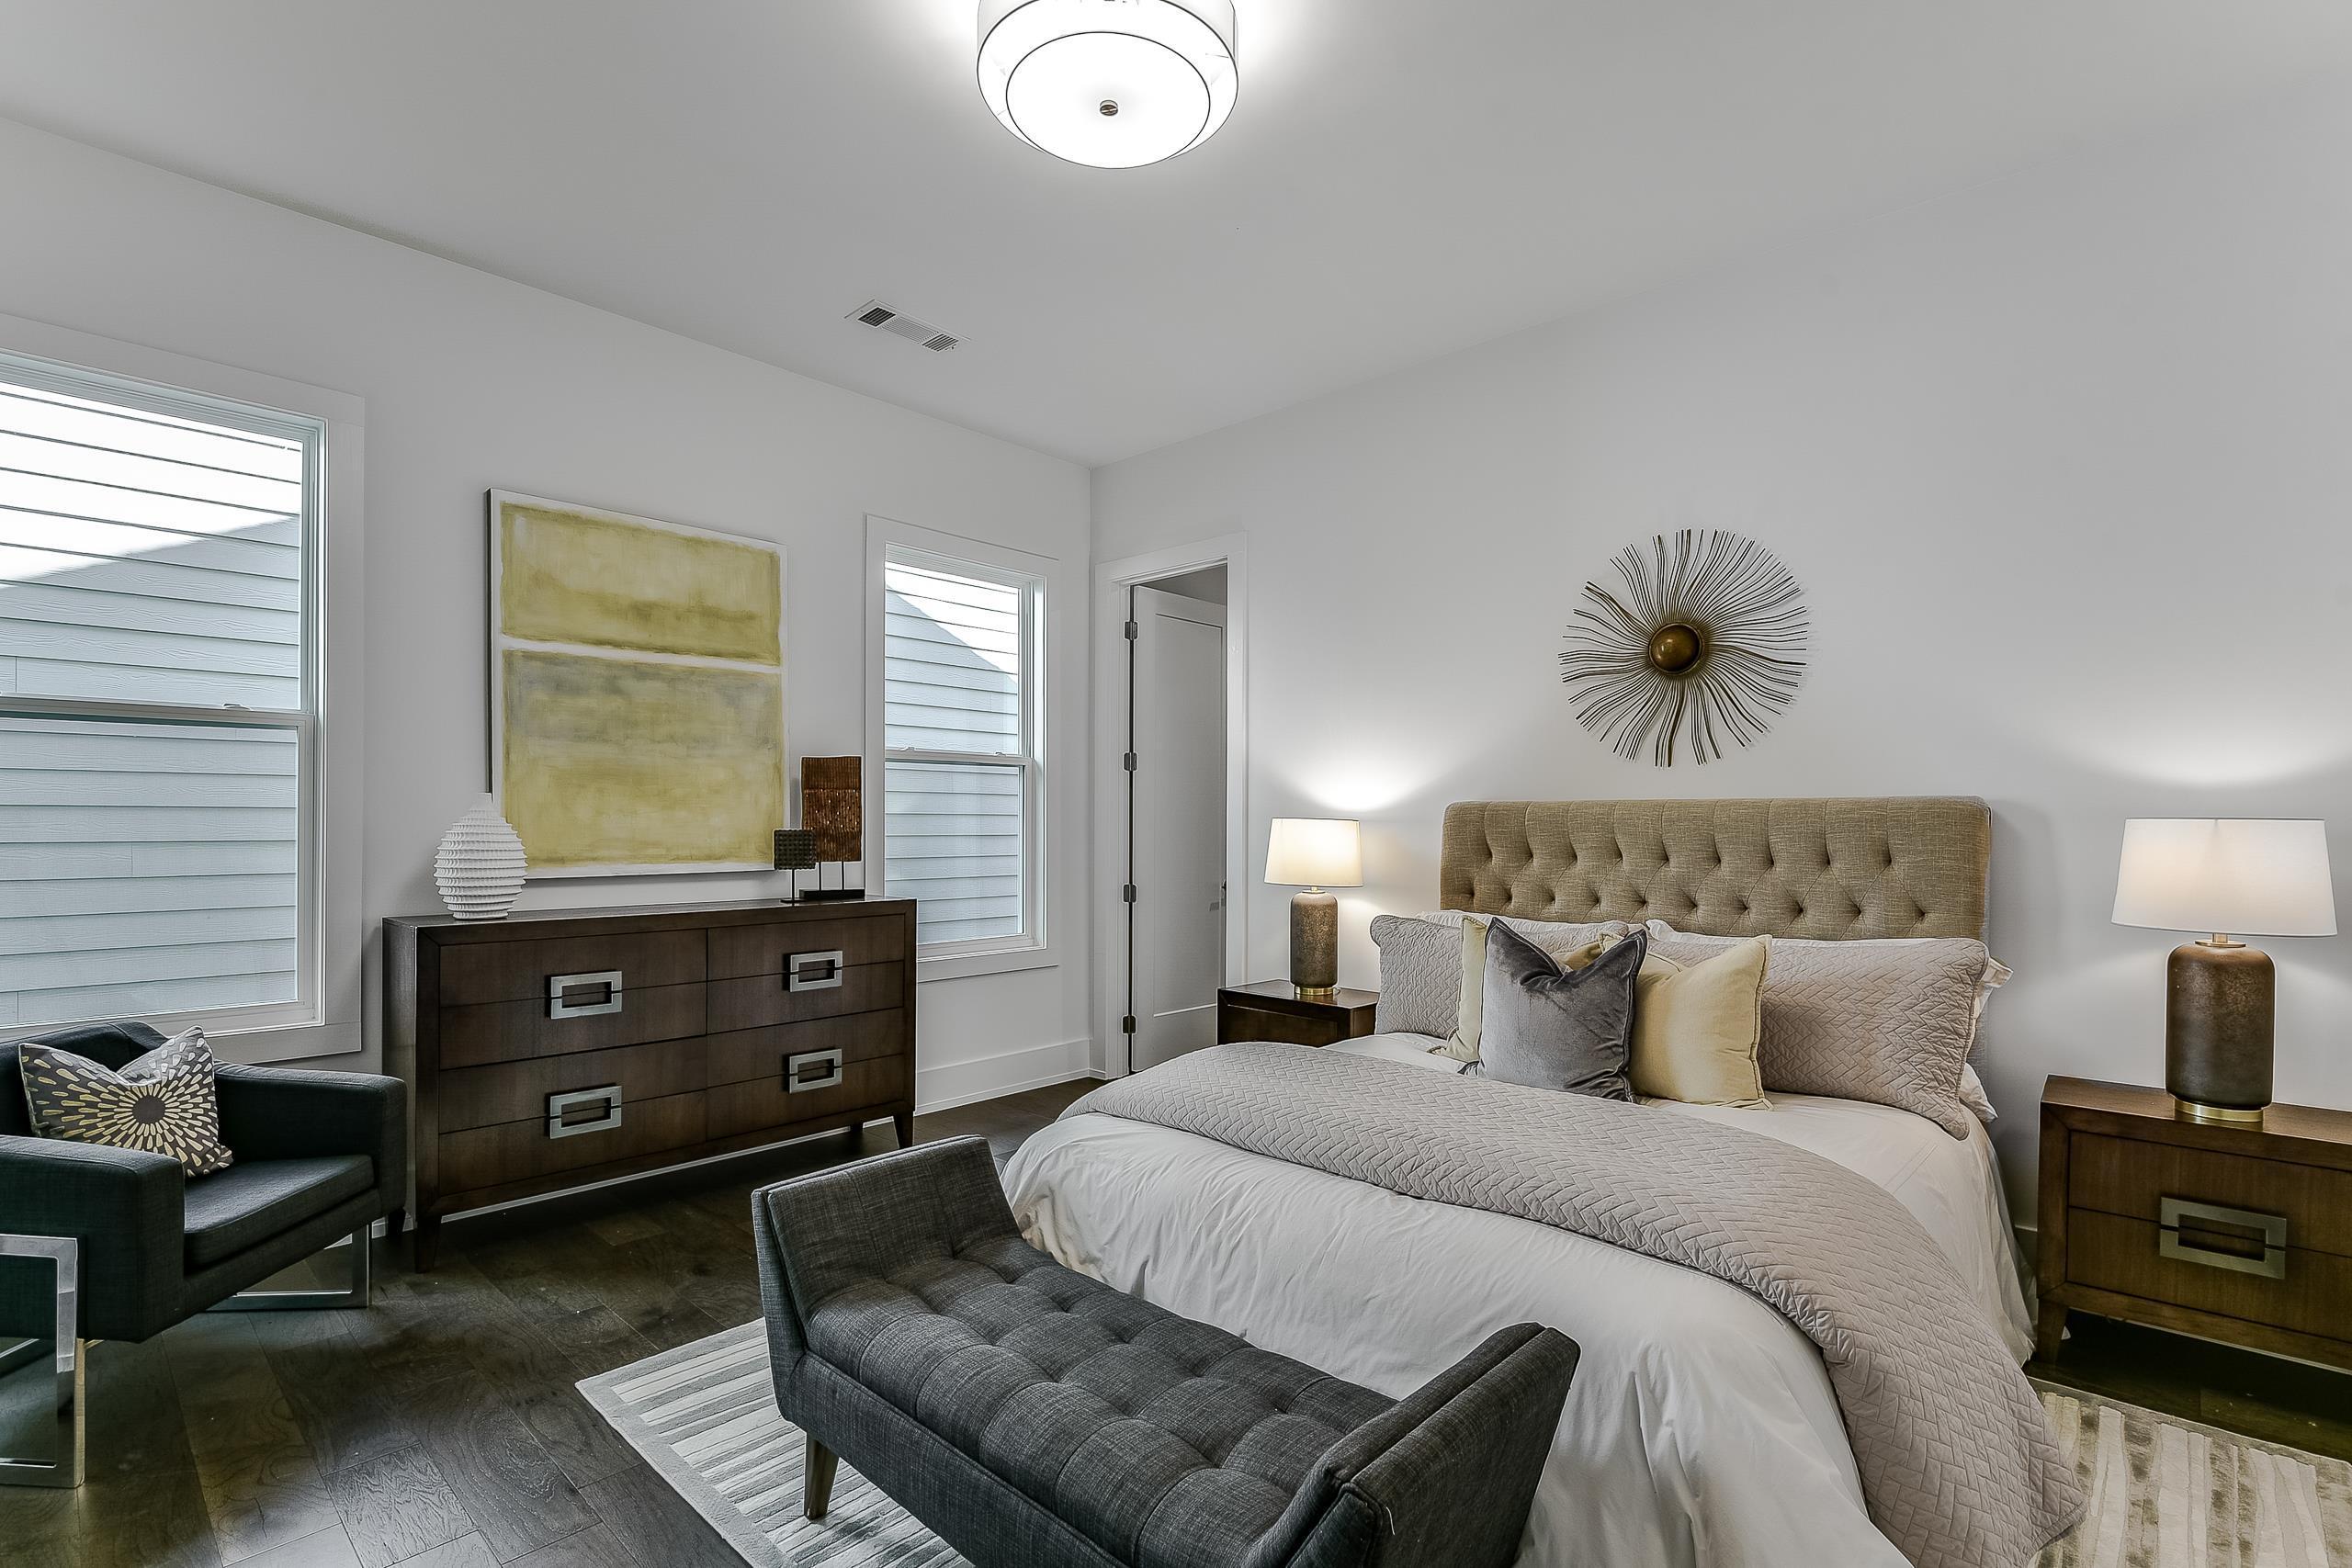 Bedroom featured in the Alston By Minerva Homes in Atlanta, GA